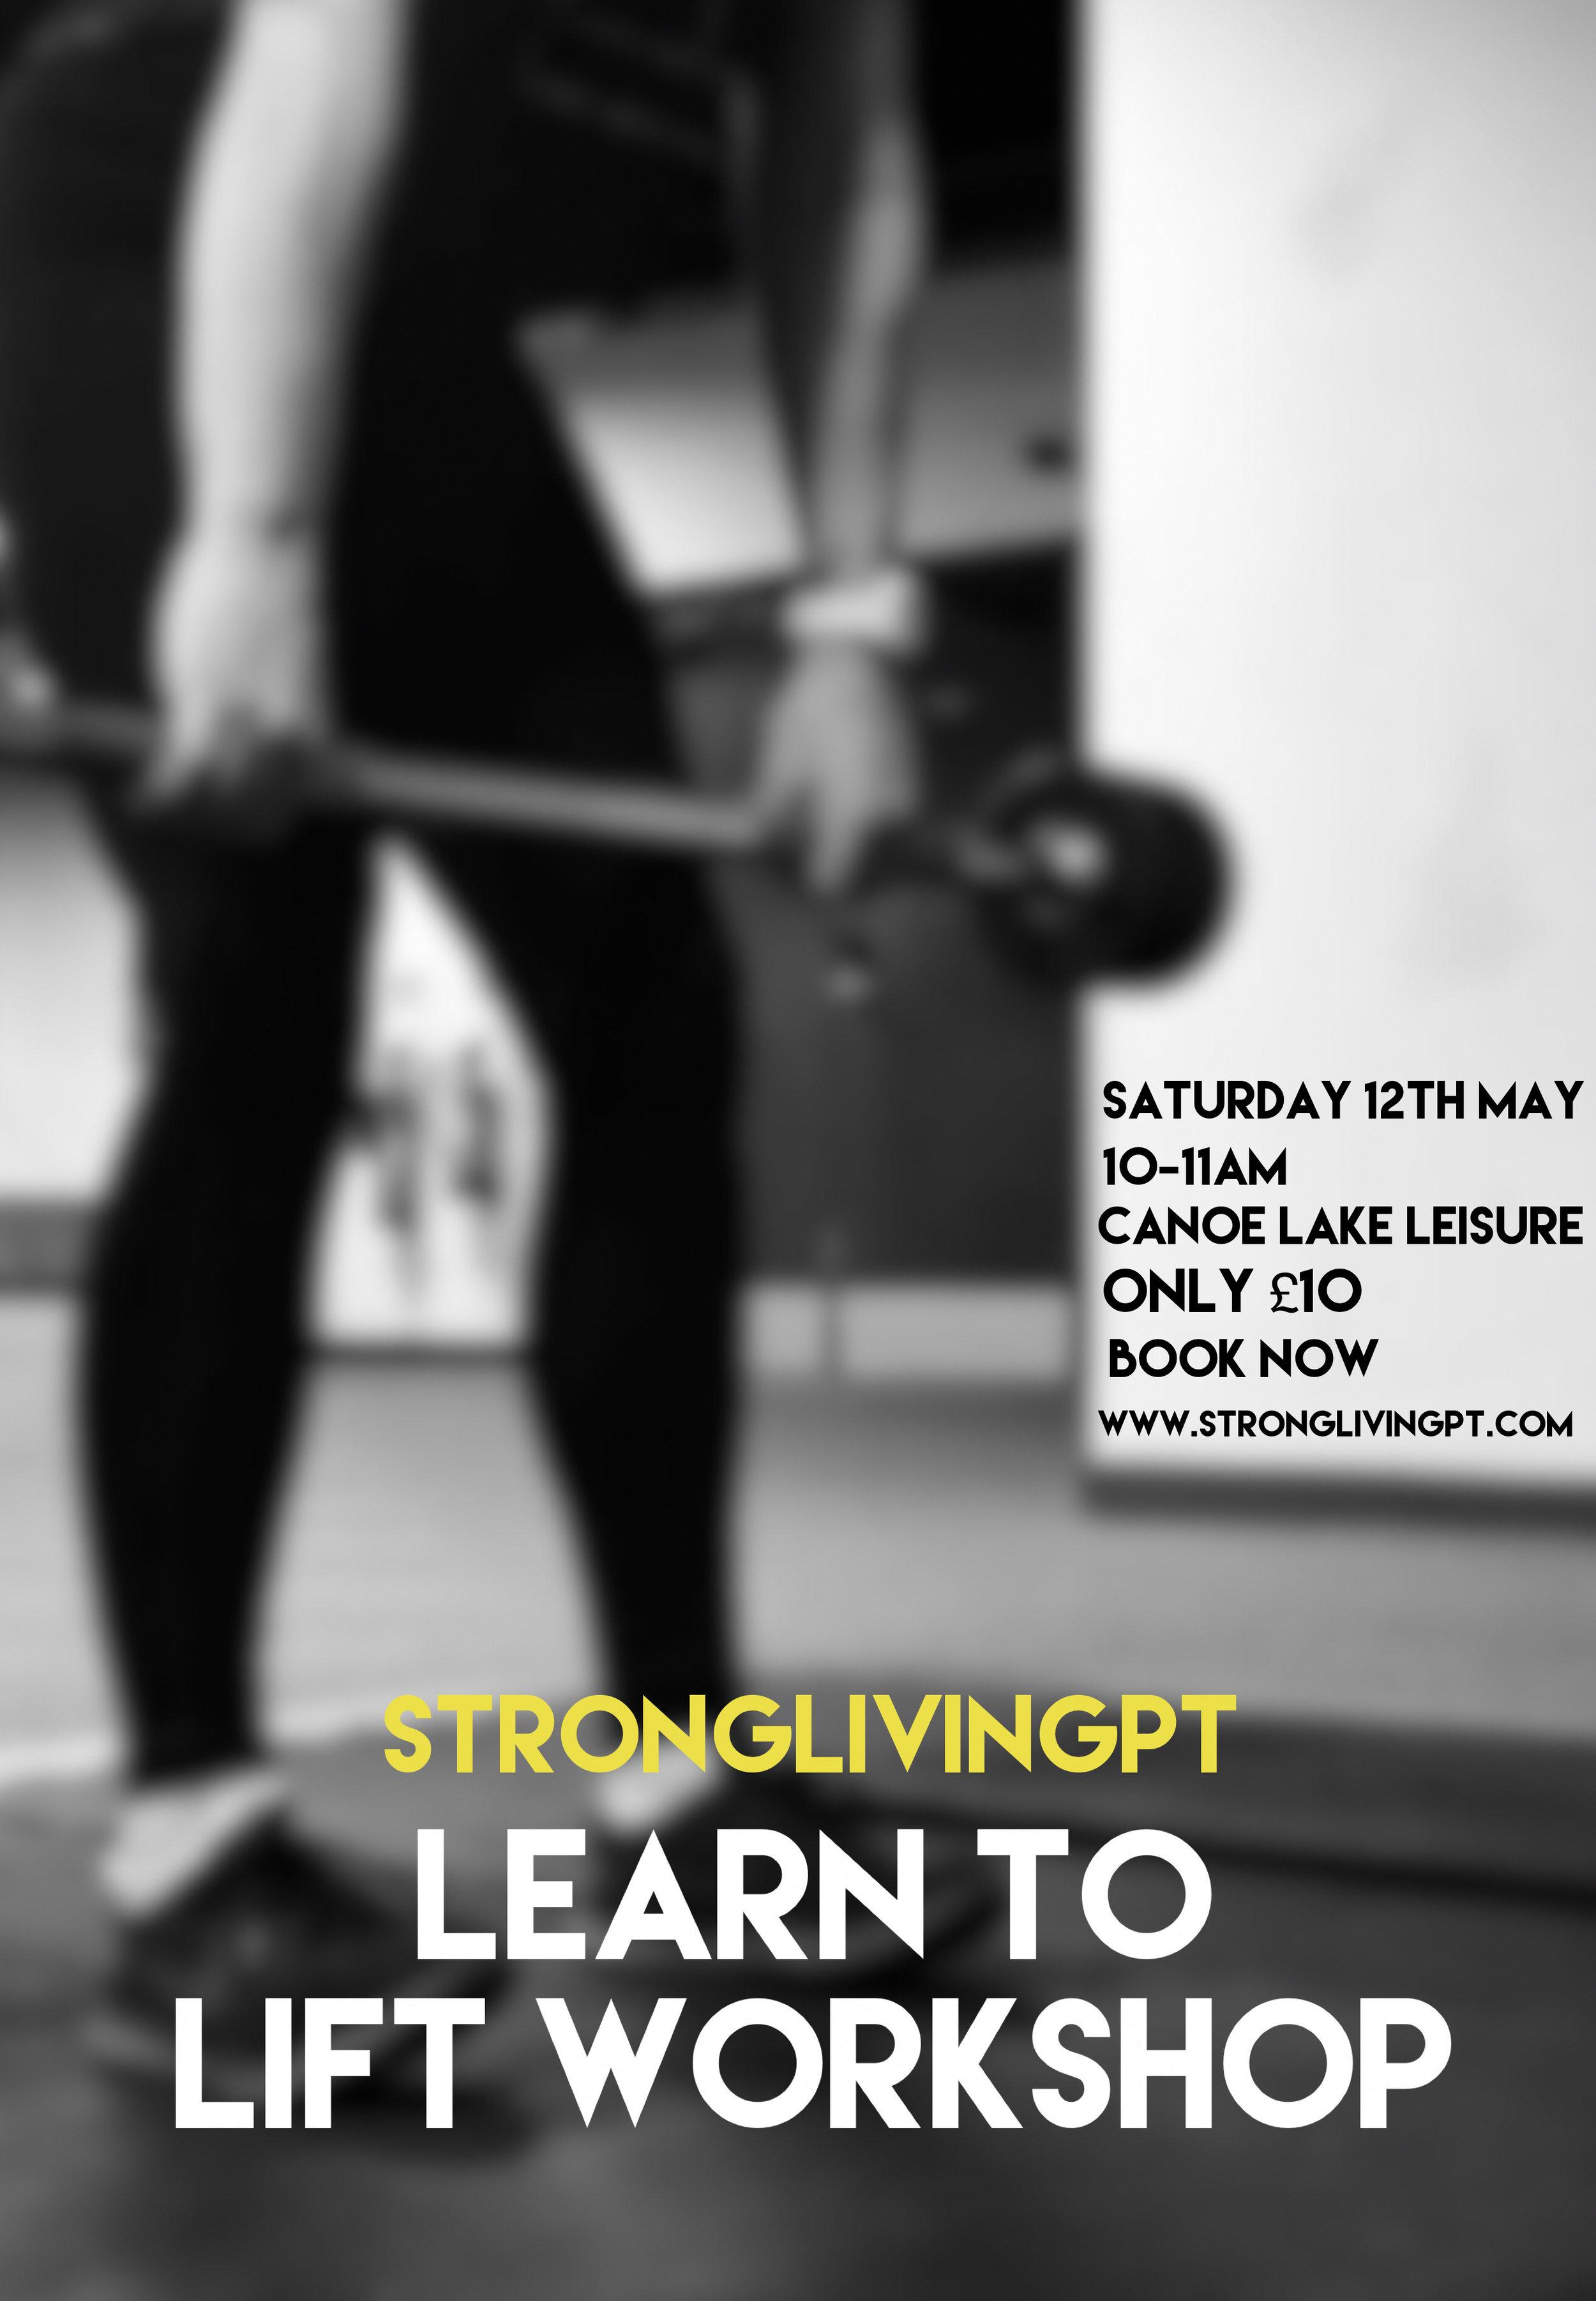 Learn to lift workshop.JPG